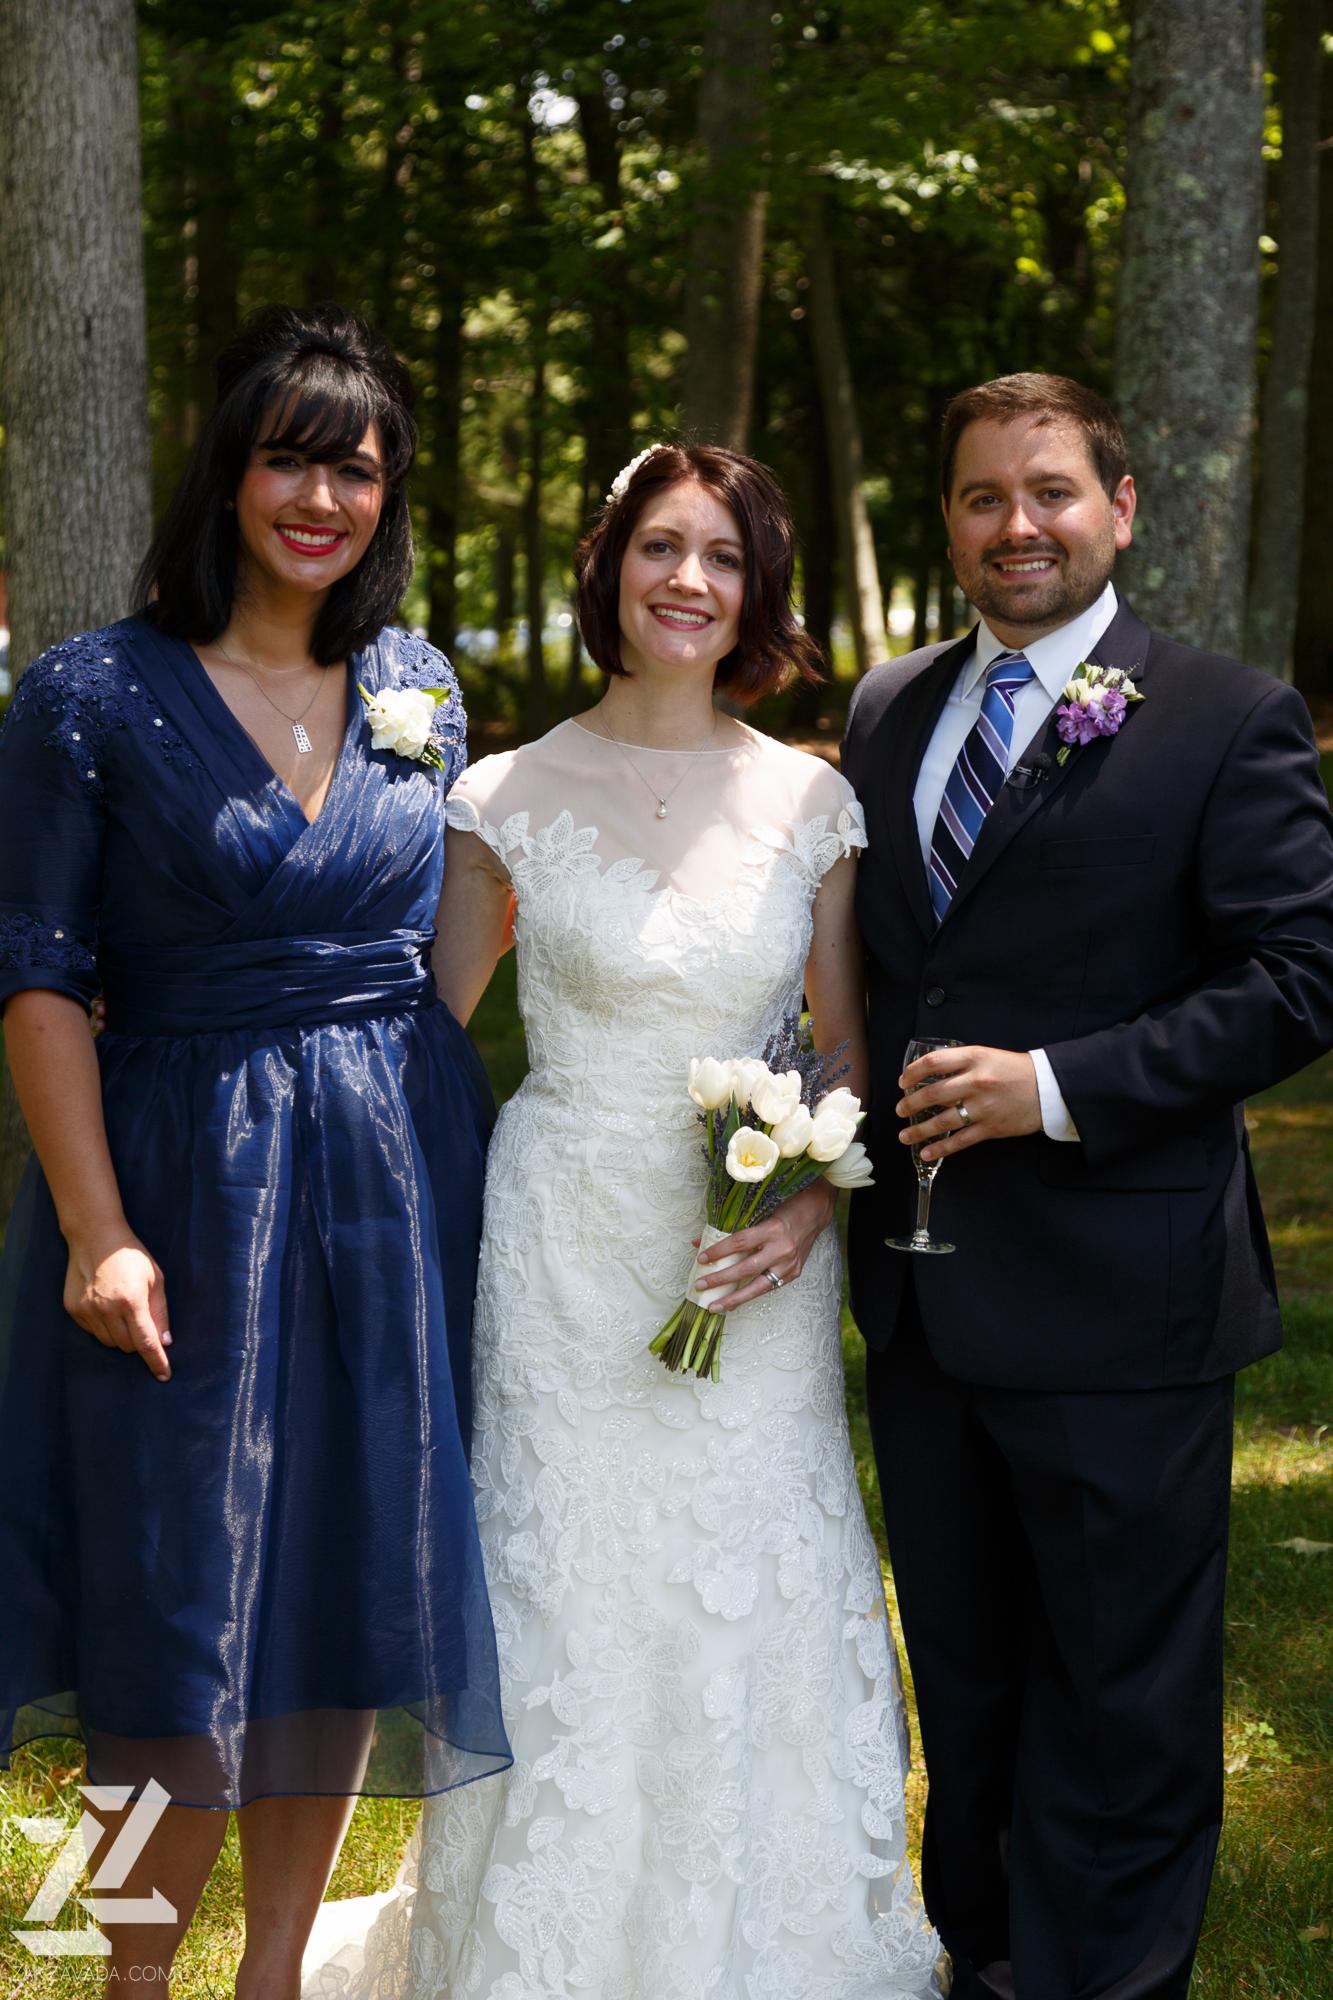 scranton-wedding-photography-zak-zavada-ruddyBelcastroWedding-459.jpg